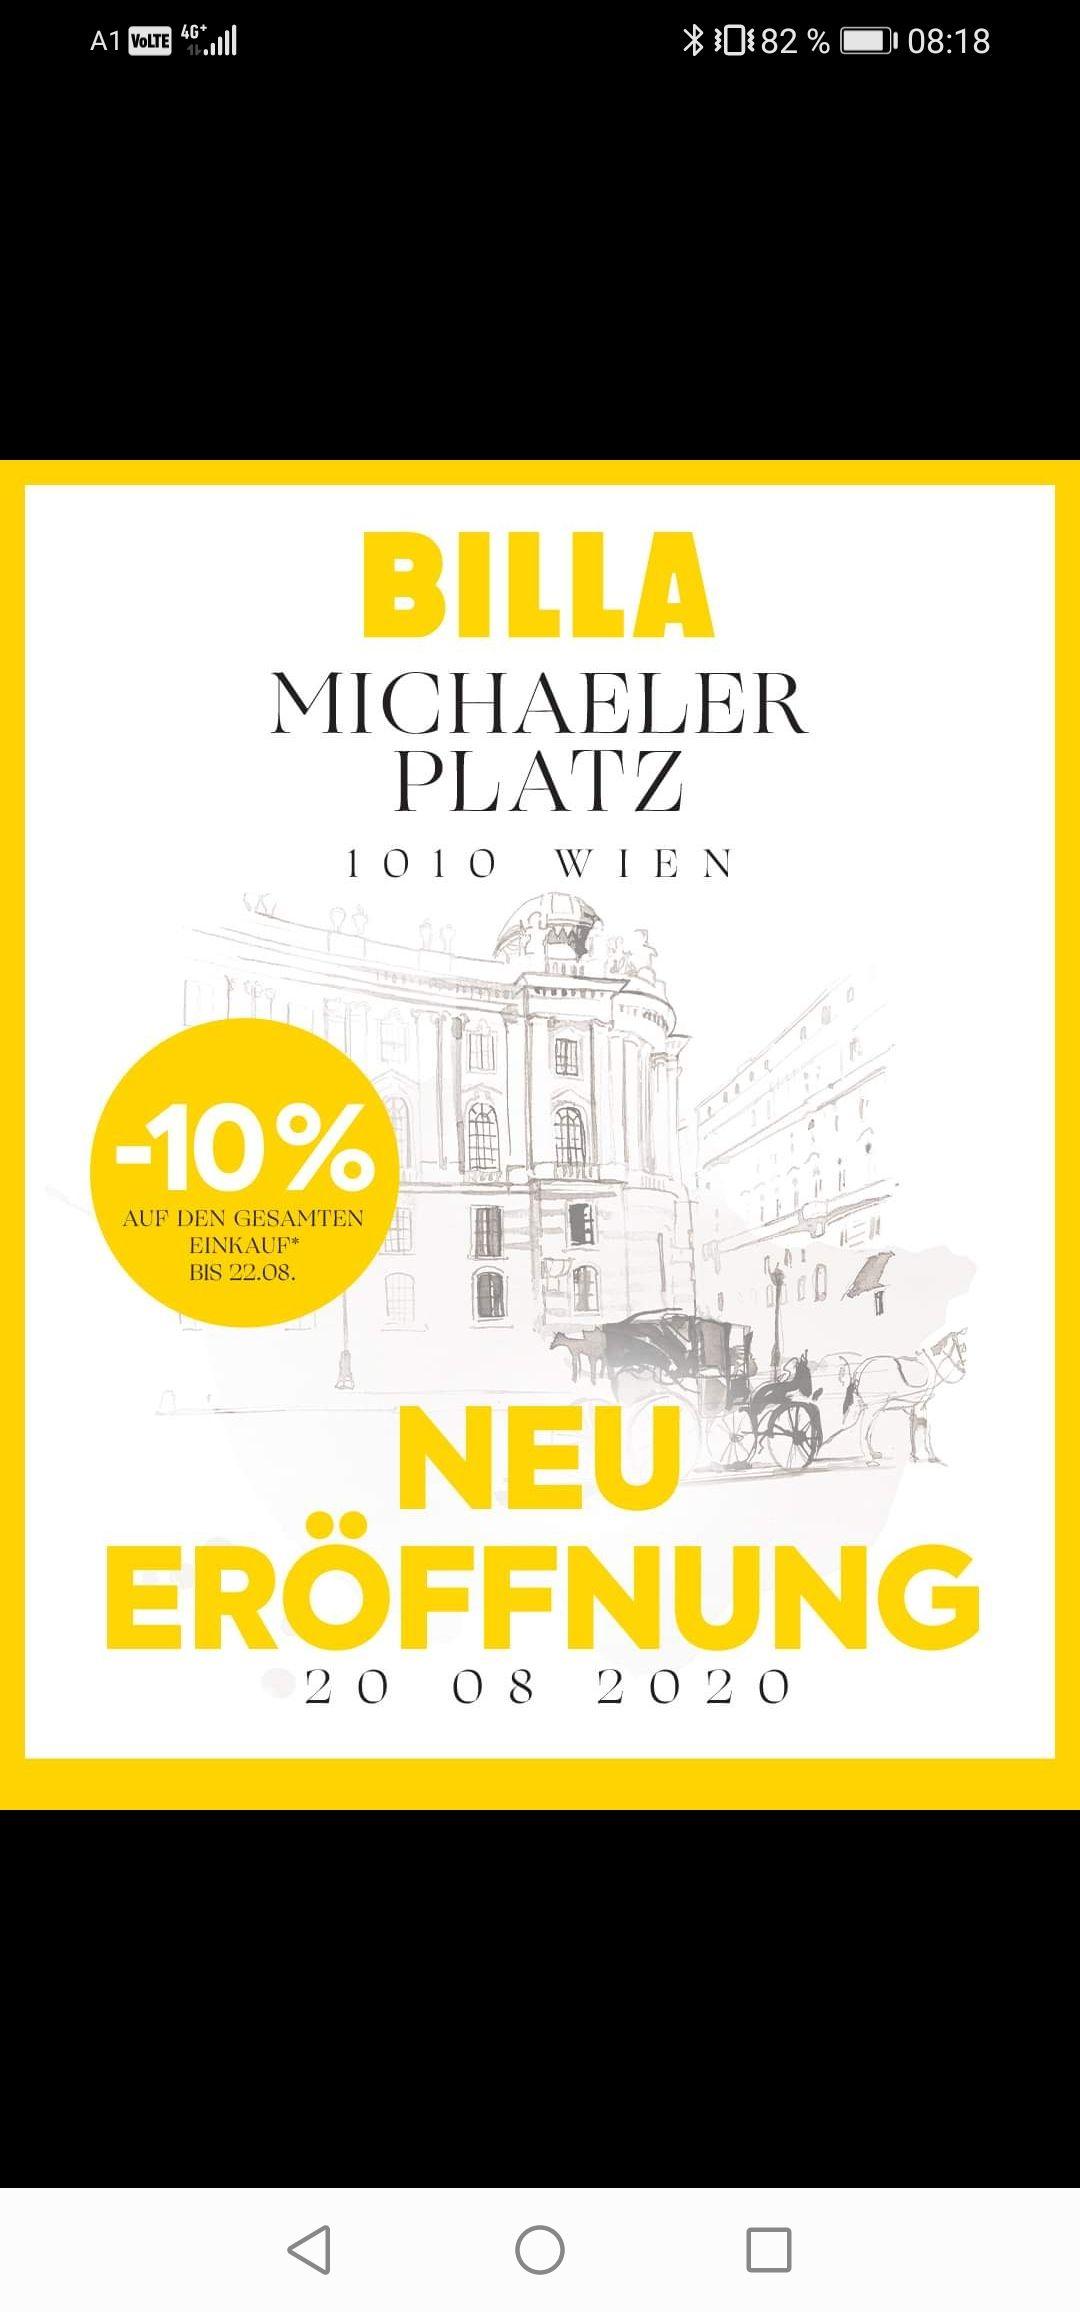 -10% Beim neuen Billa am Michaelerplatz